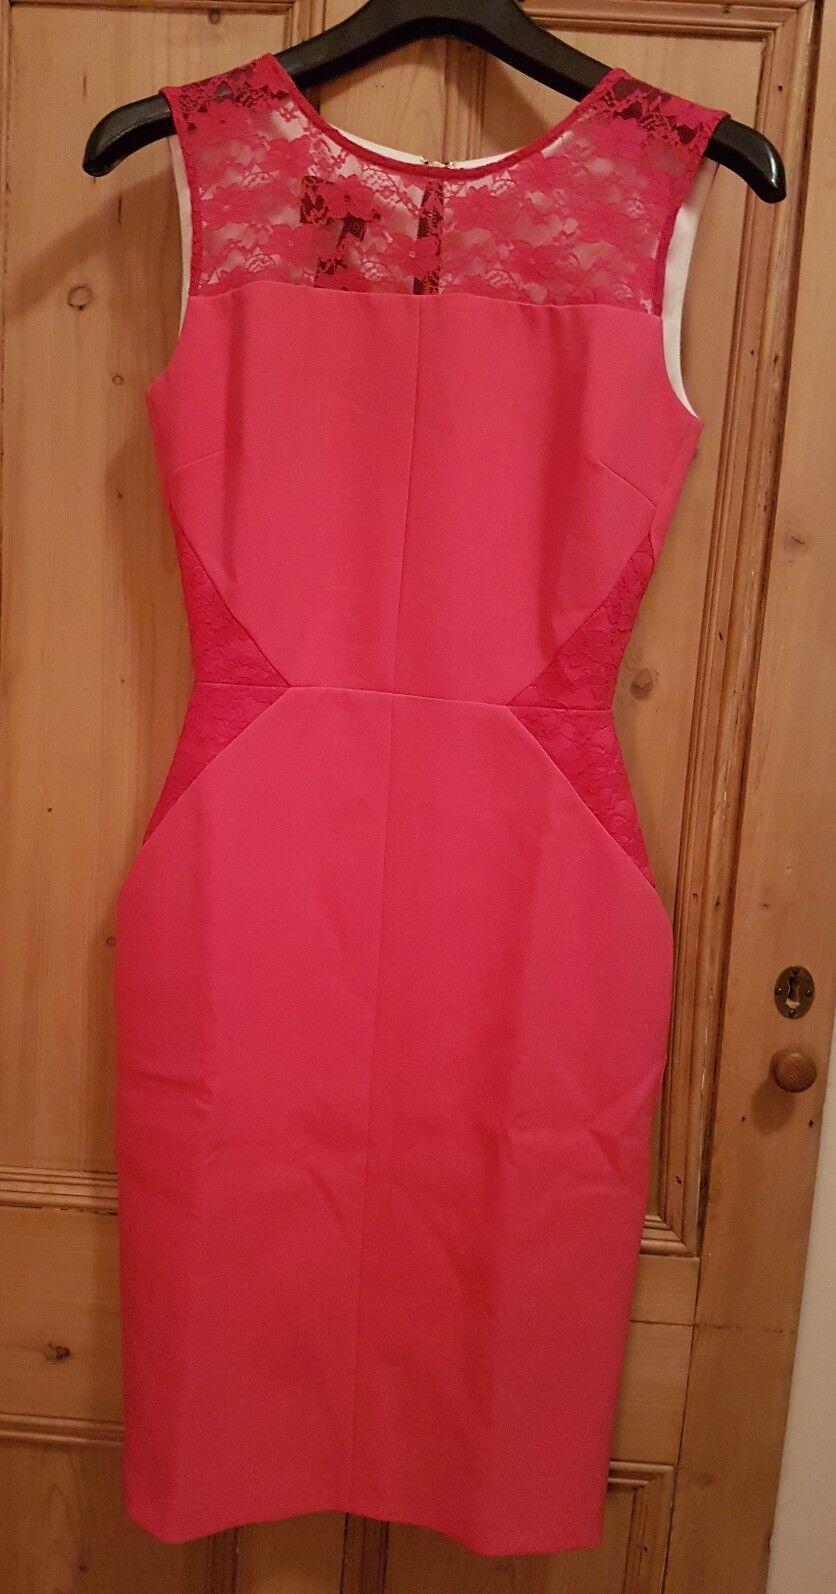 LADIES HYBRID, Suhani Dress BODYCON PENCIL, Rosa-  Größe 8 - RRP